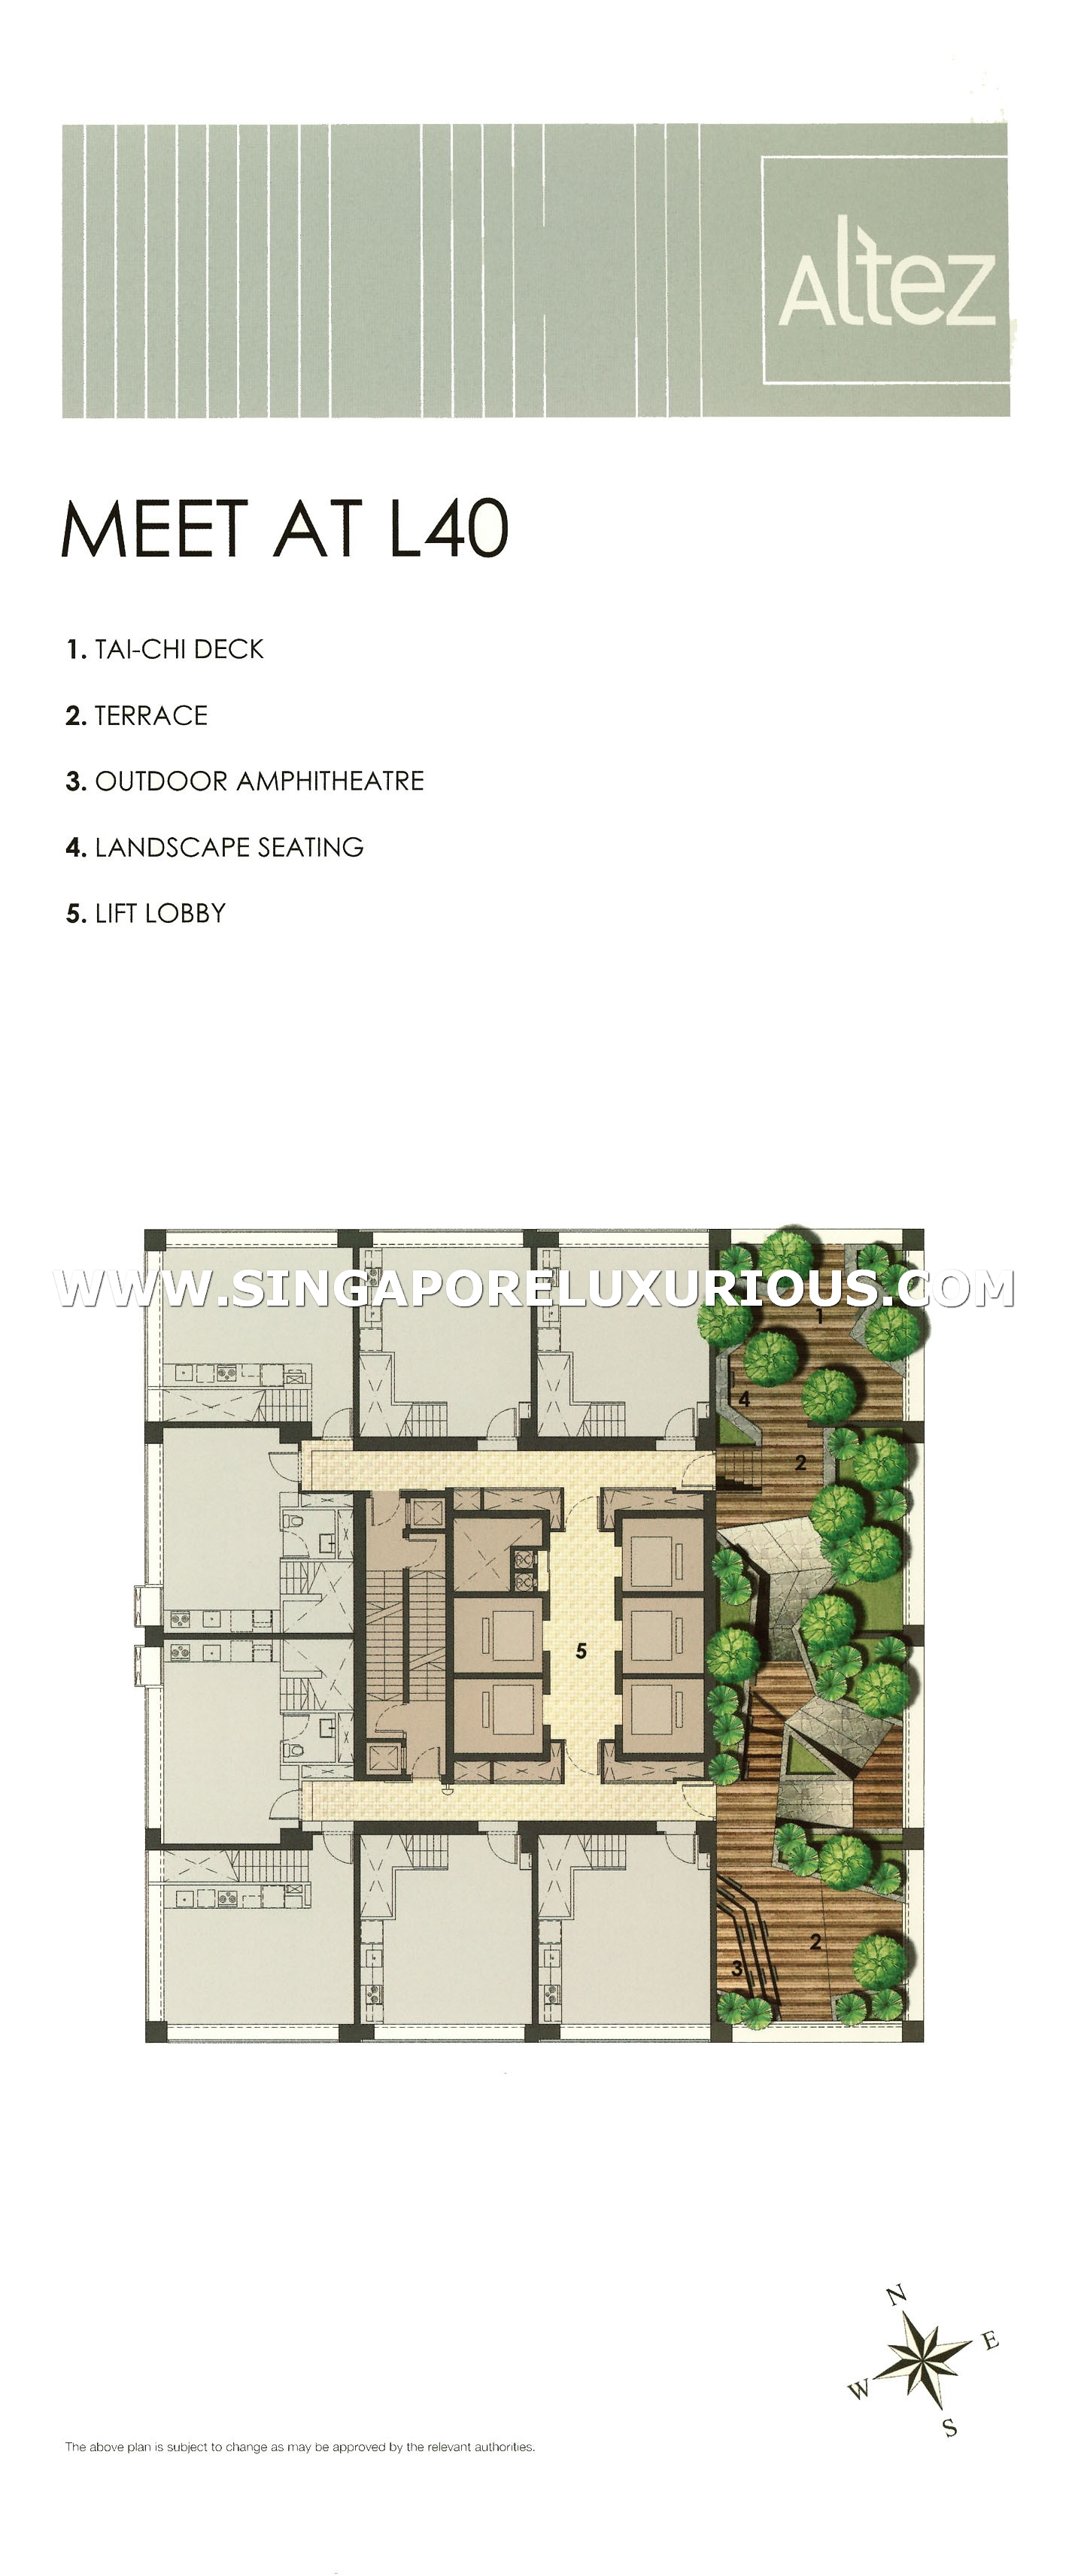 Altez Site Amp Floor Plan Singapore Luxurious Property